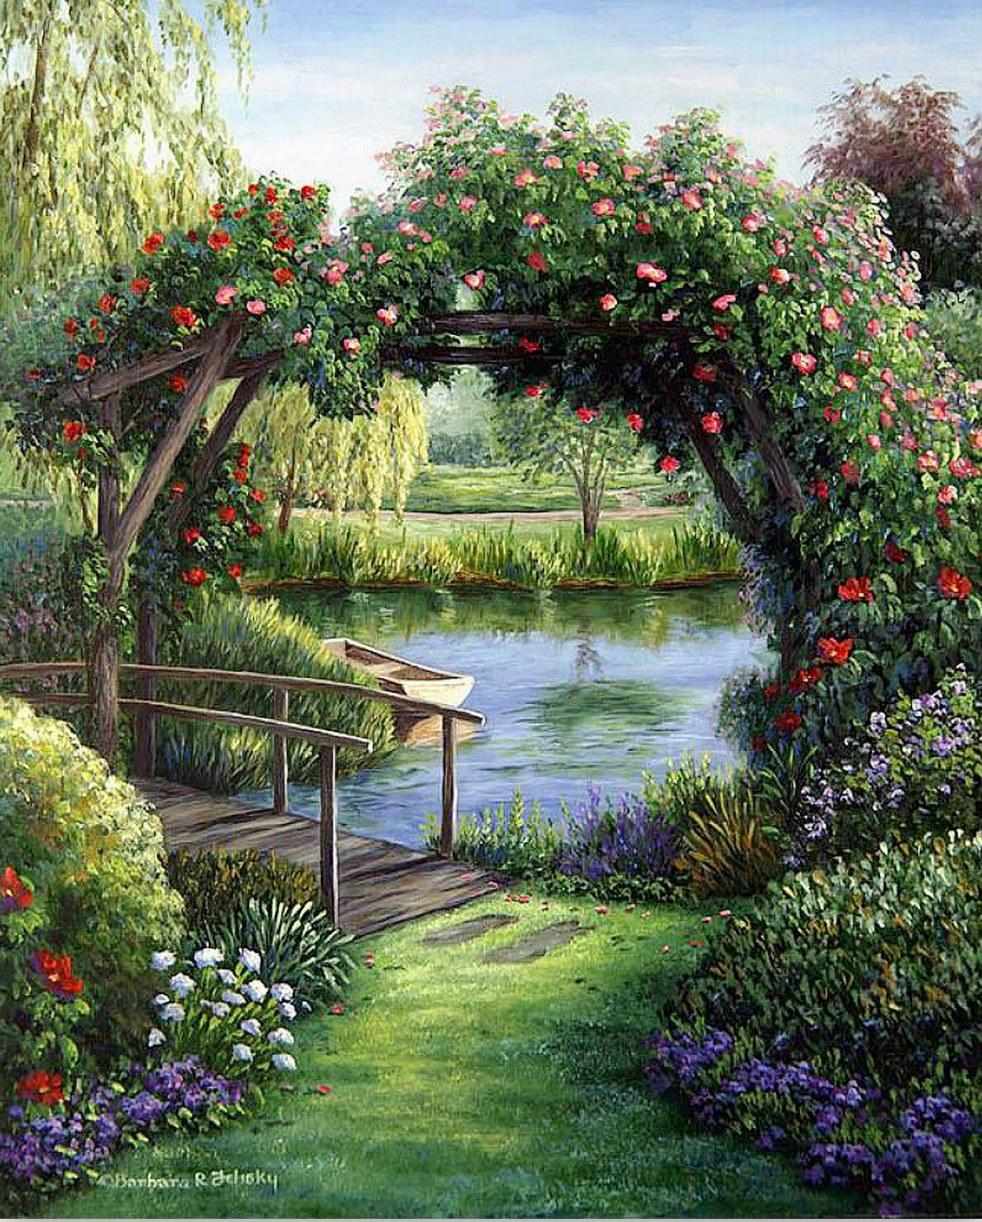 Pintura moderna y fotograf a art stica cuadros de - Oleos de jardines ...